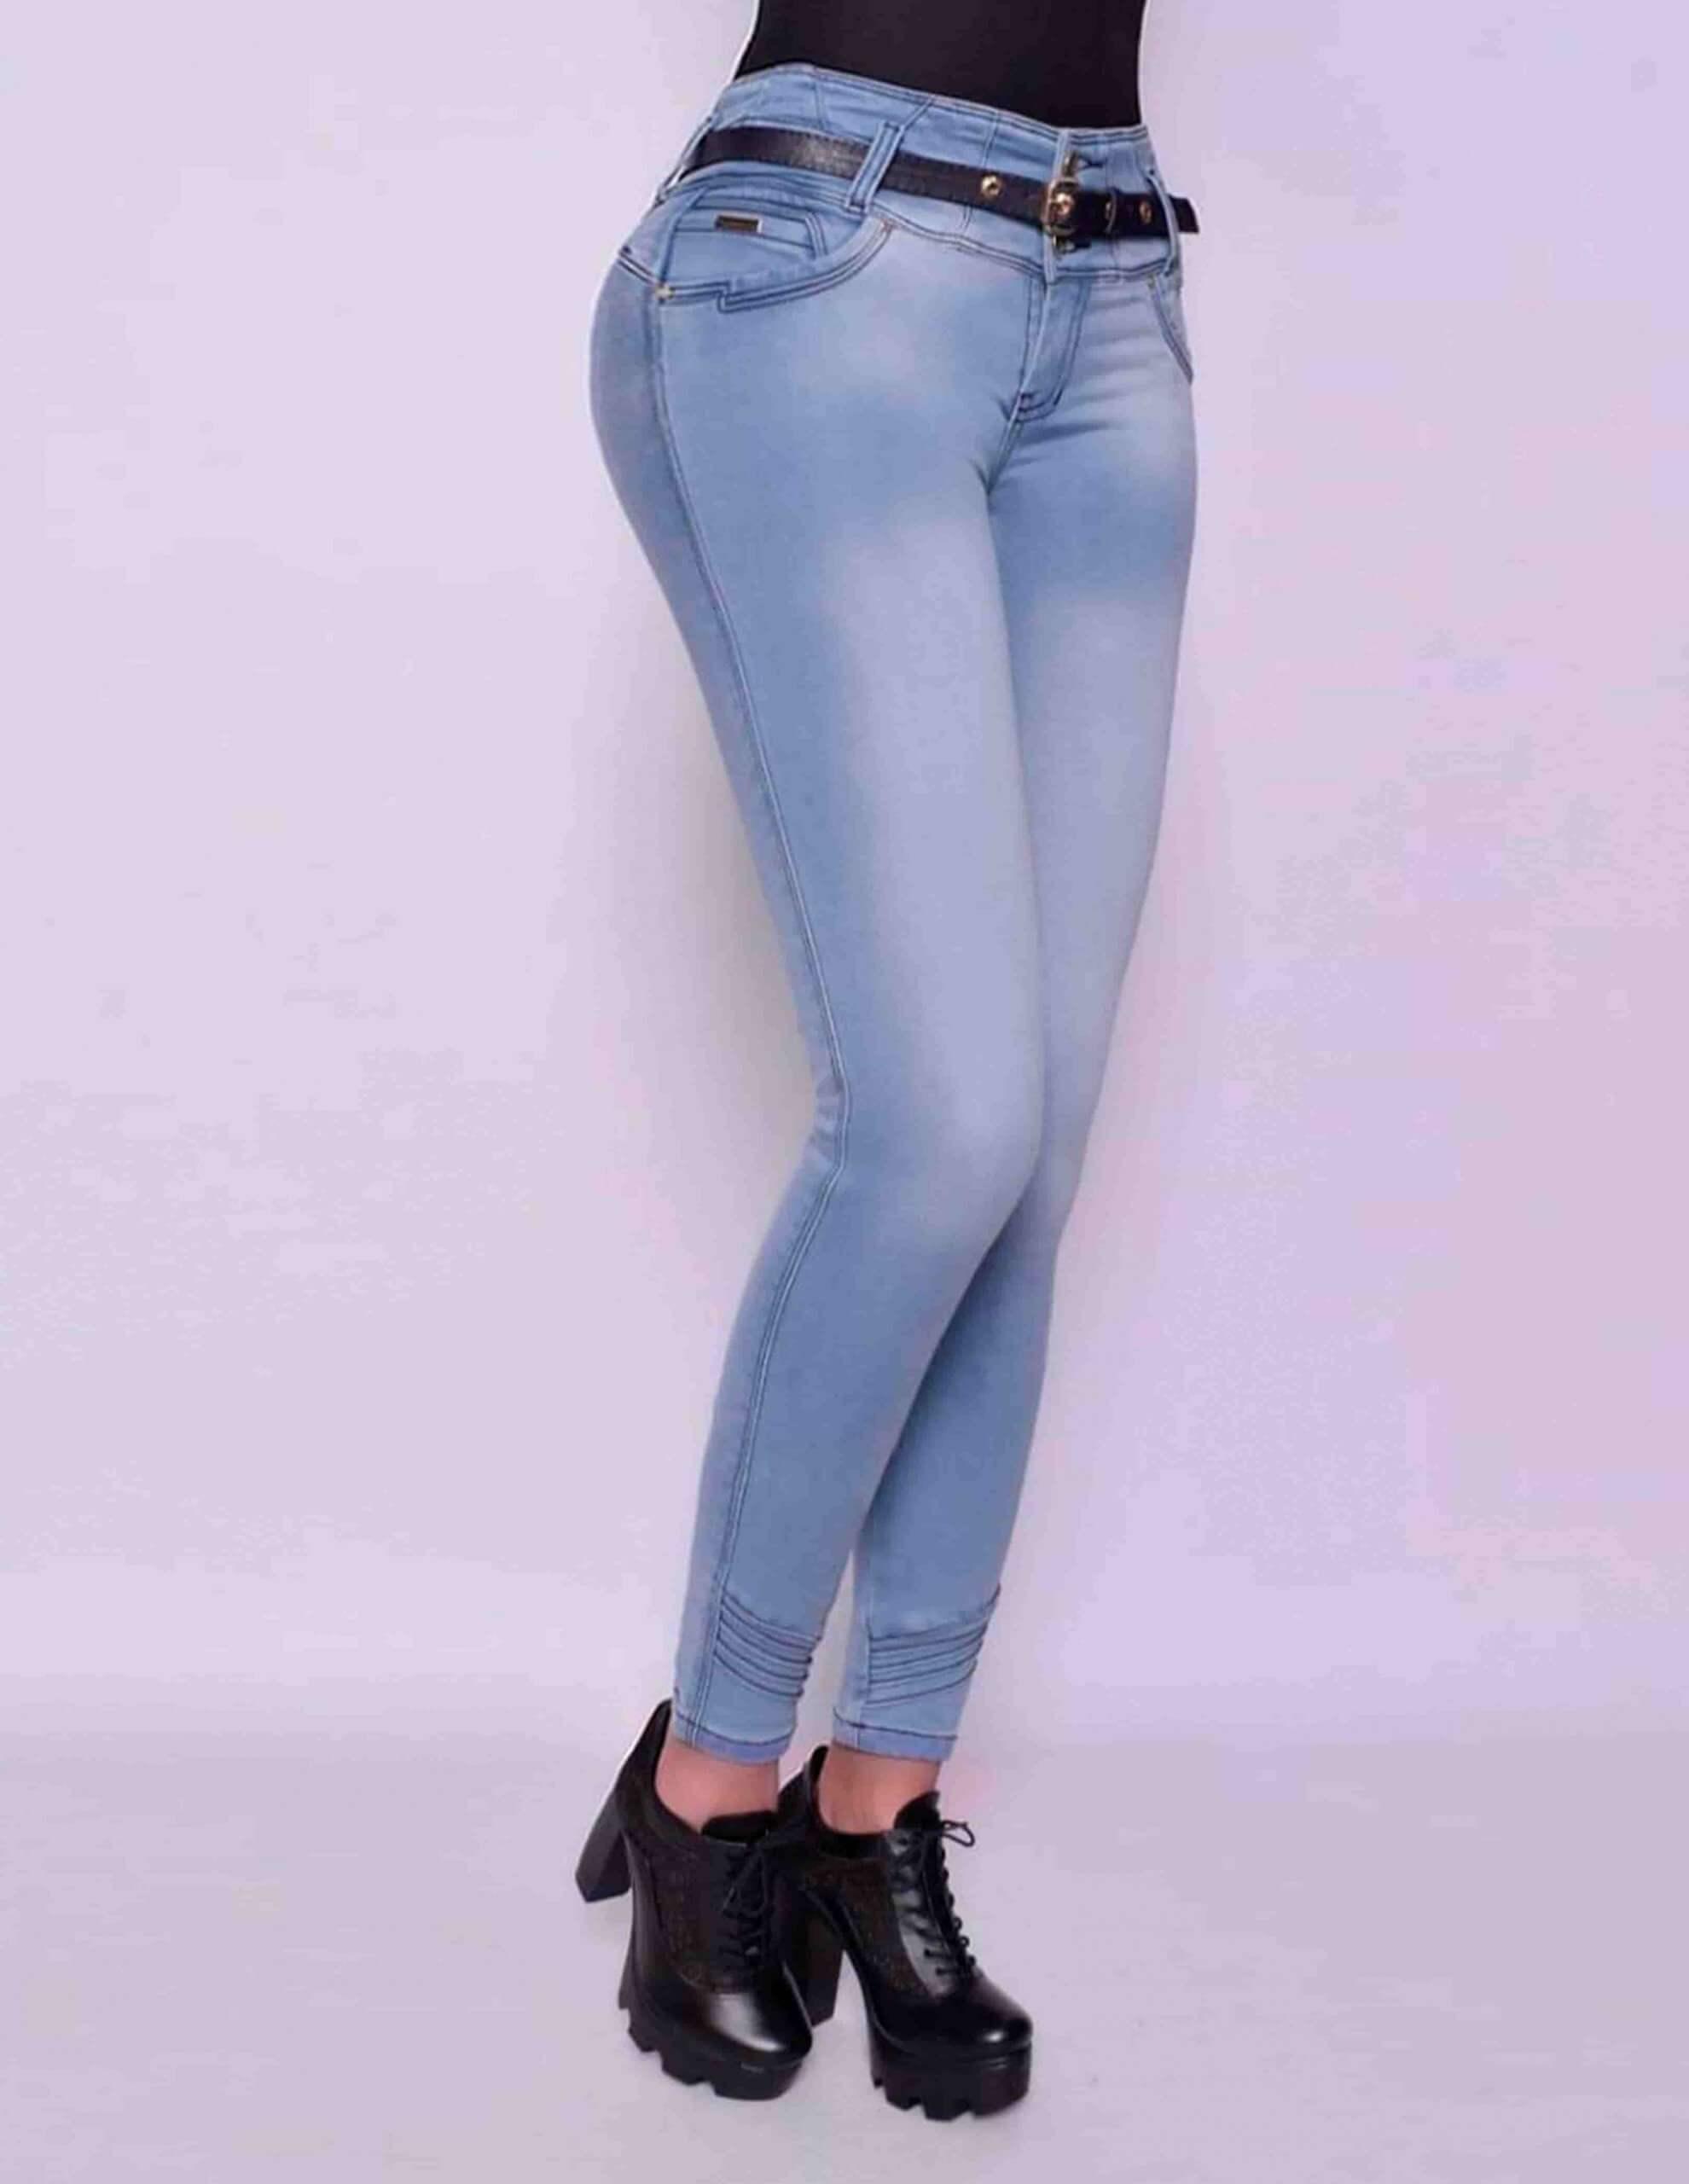 jeans-colombianos-jeans-para-mujer-al-por-mayor-petrolizadojeans-jeans-ref-p02-603-frente_optimized-min.